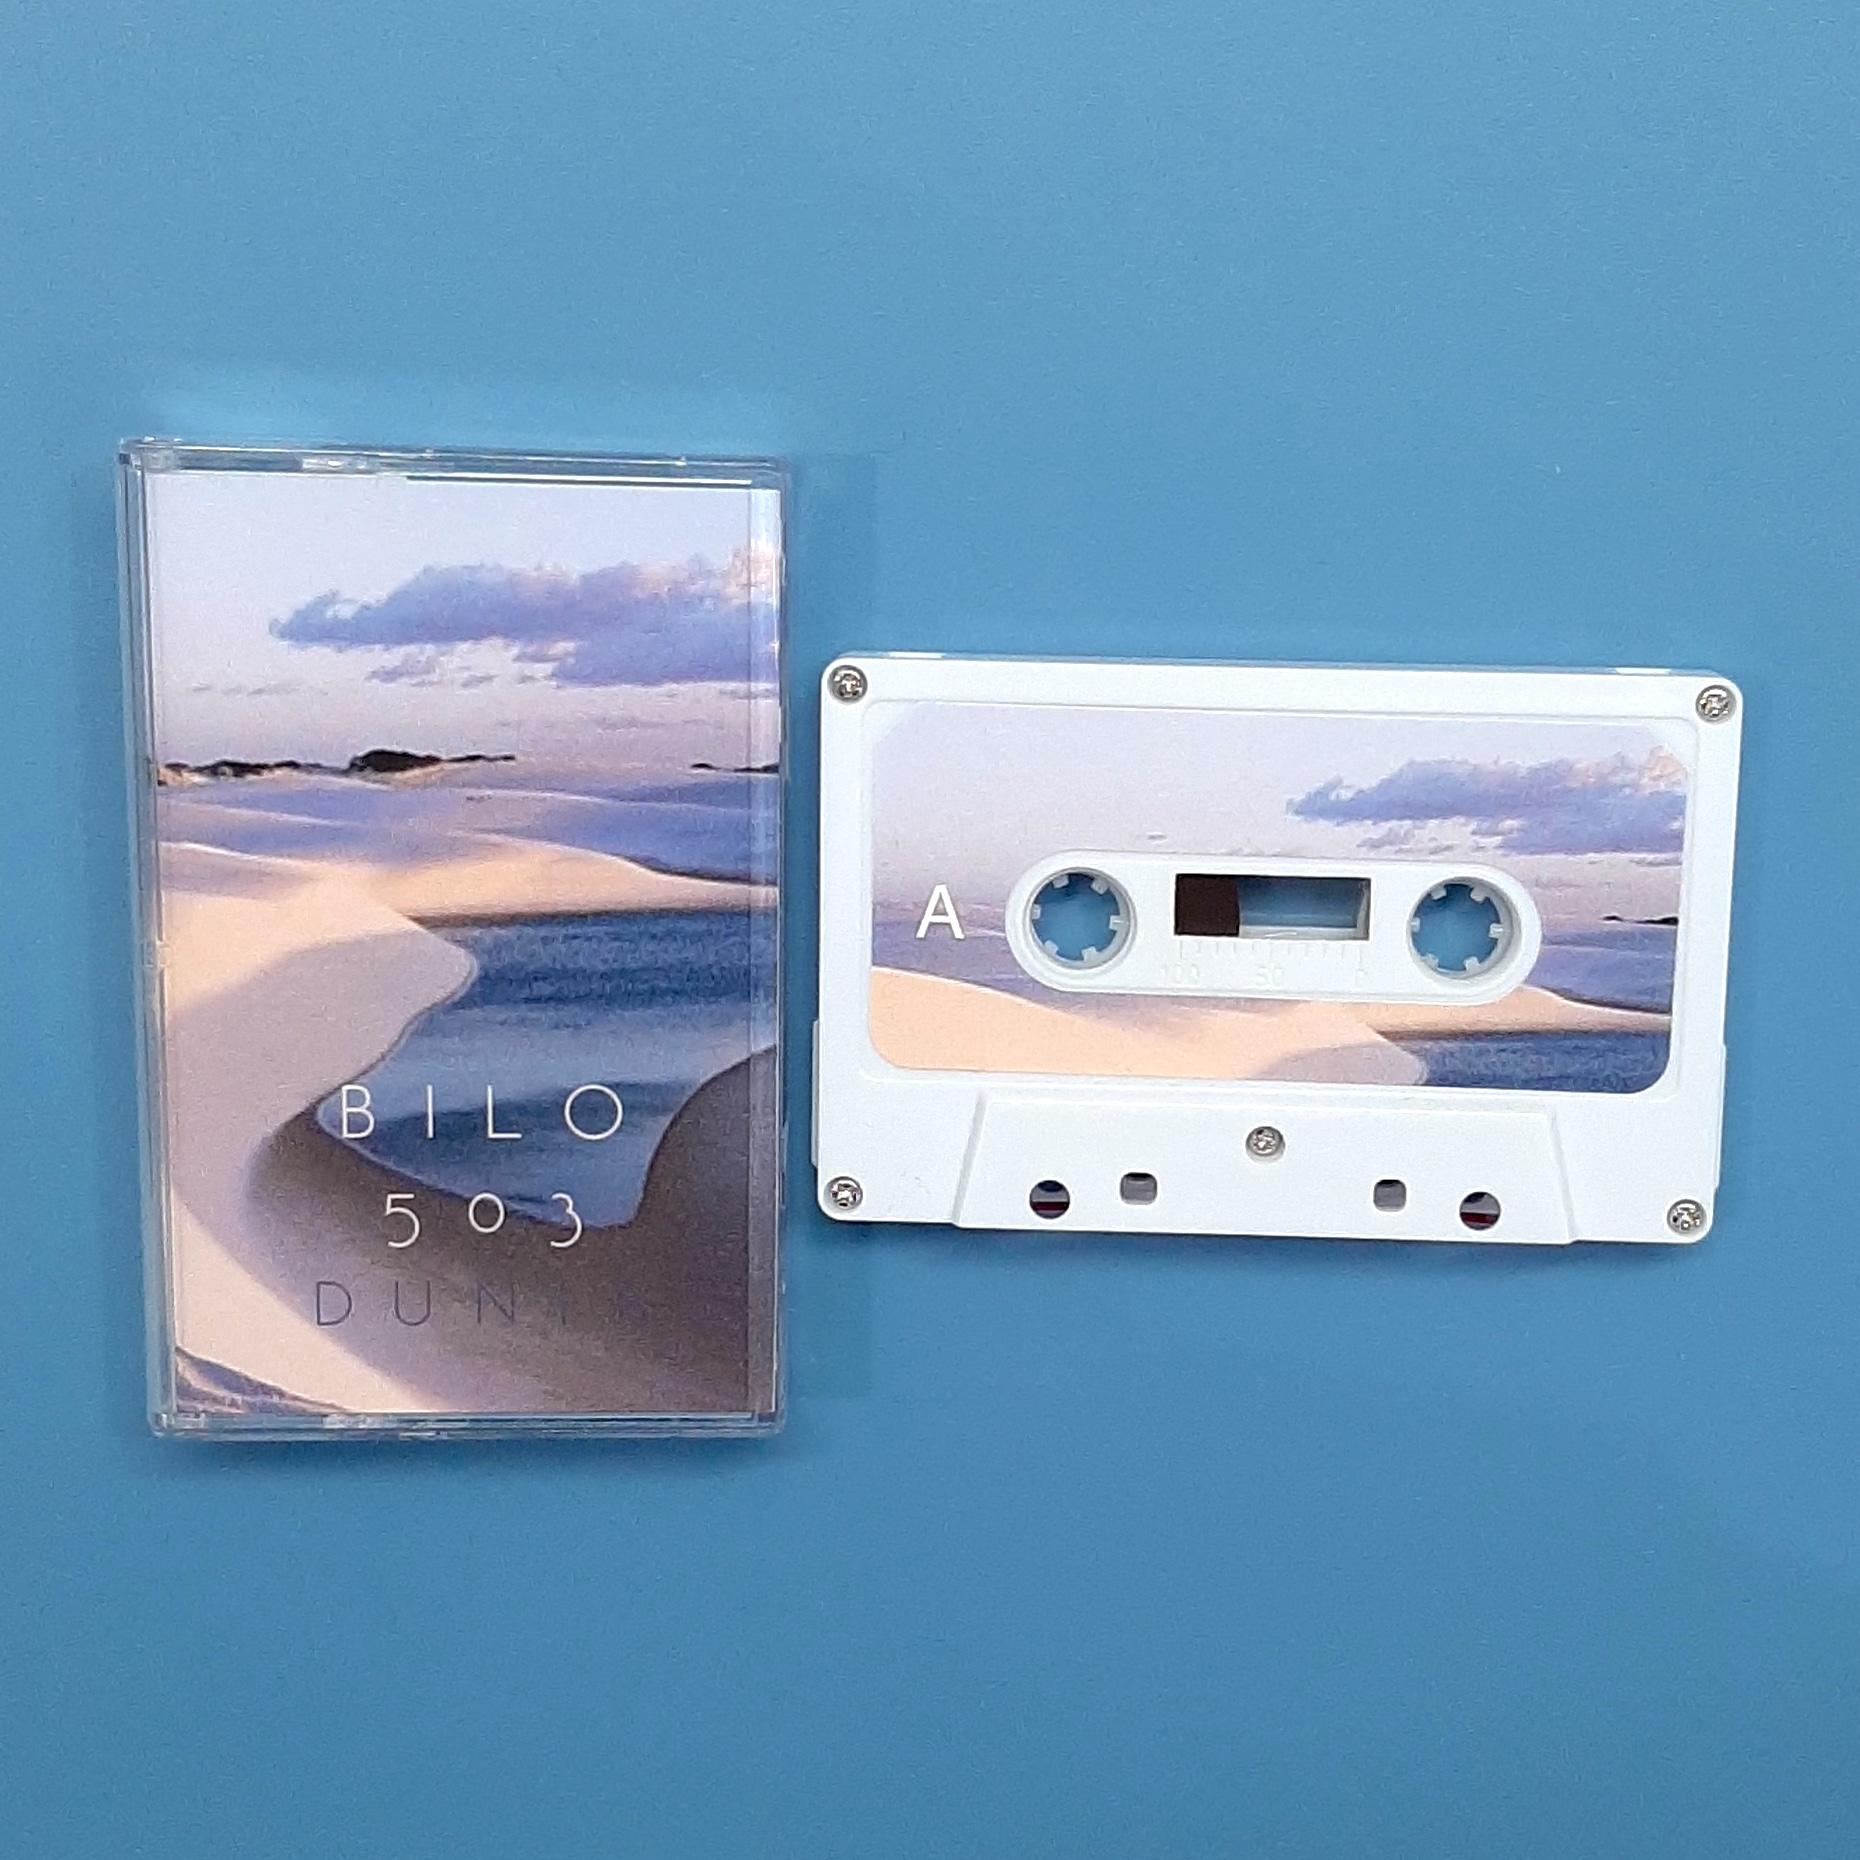 Bilo 503 - Dunia (Inner Ocean Records)